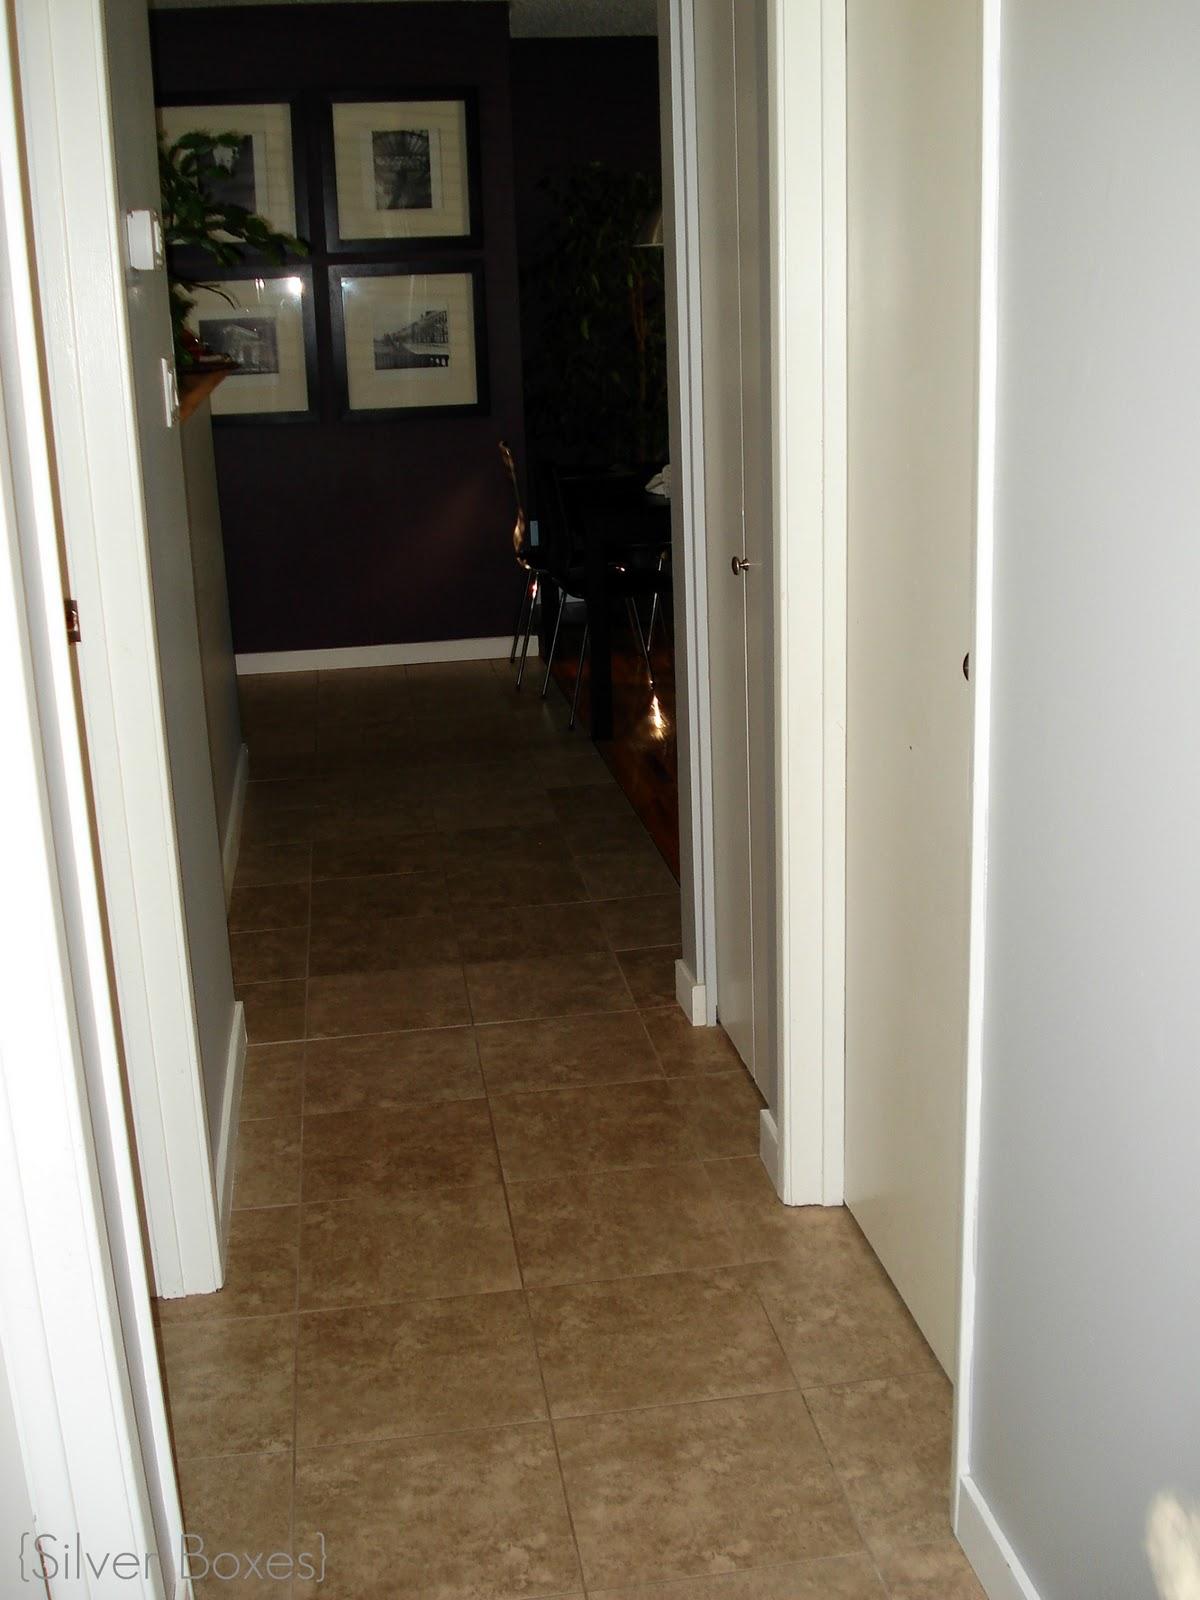 Lighting Basement Washroom Stairs: Silver Boxes: September 2011